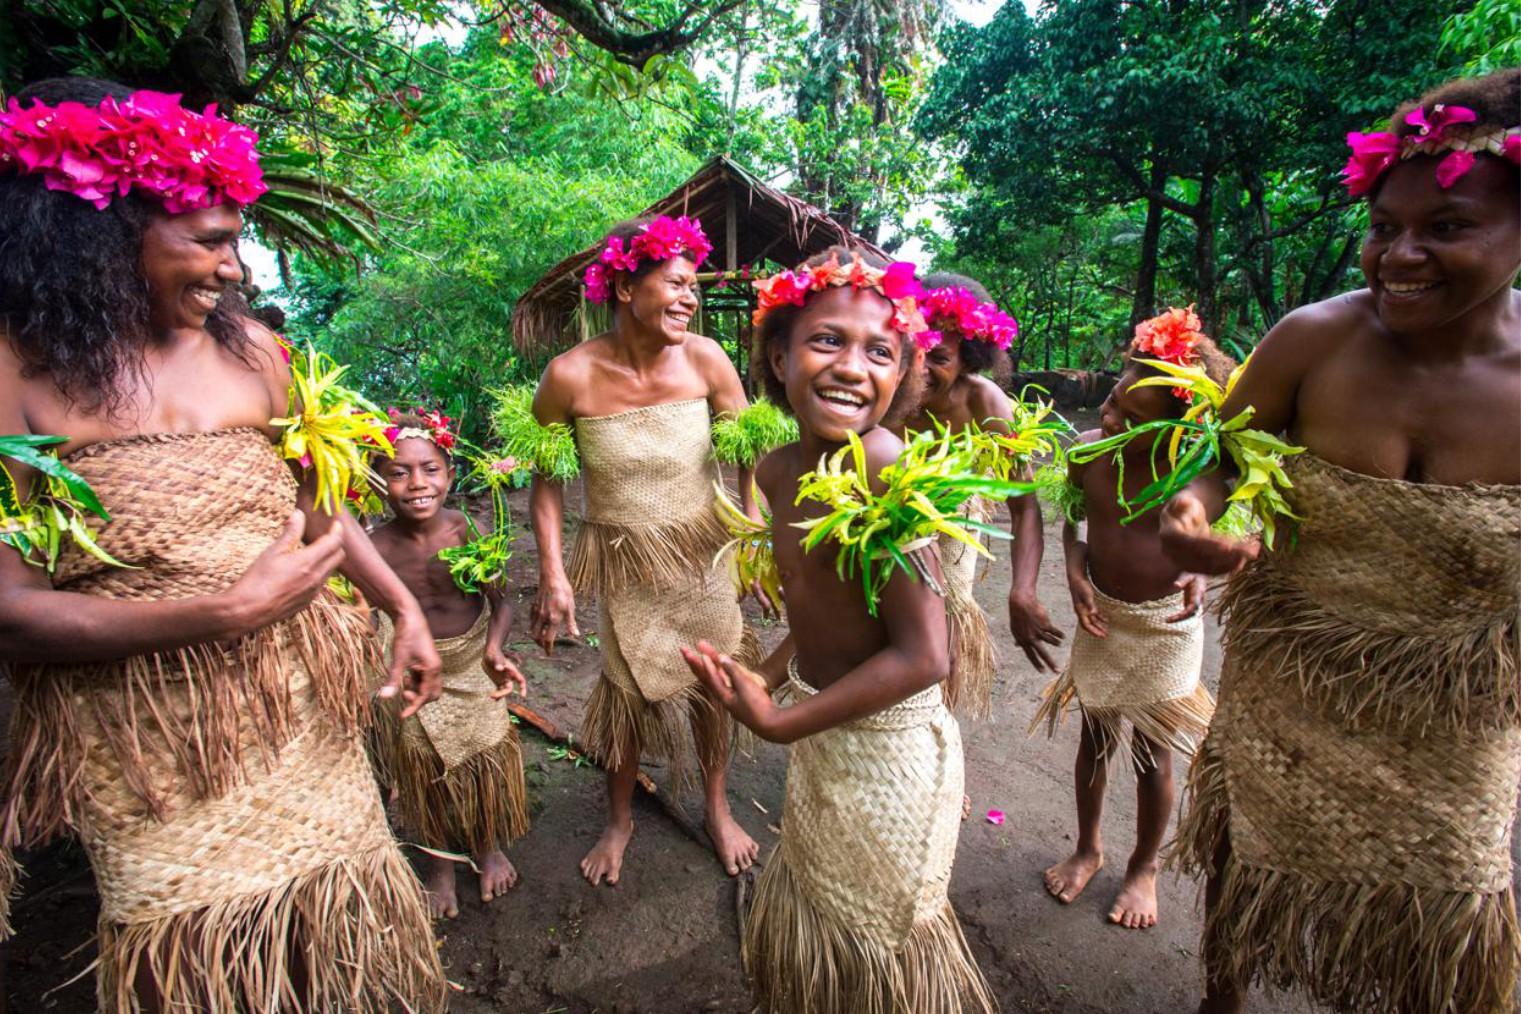 Vanuatu travel. Вануату - туристический справочник